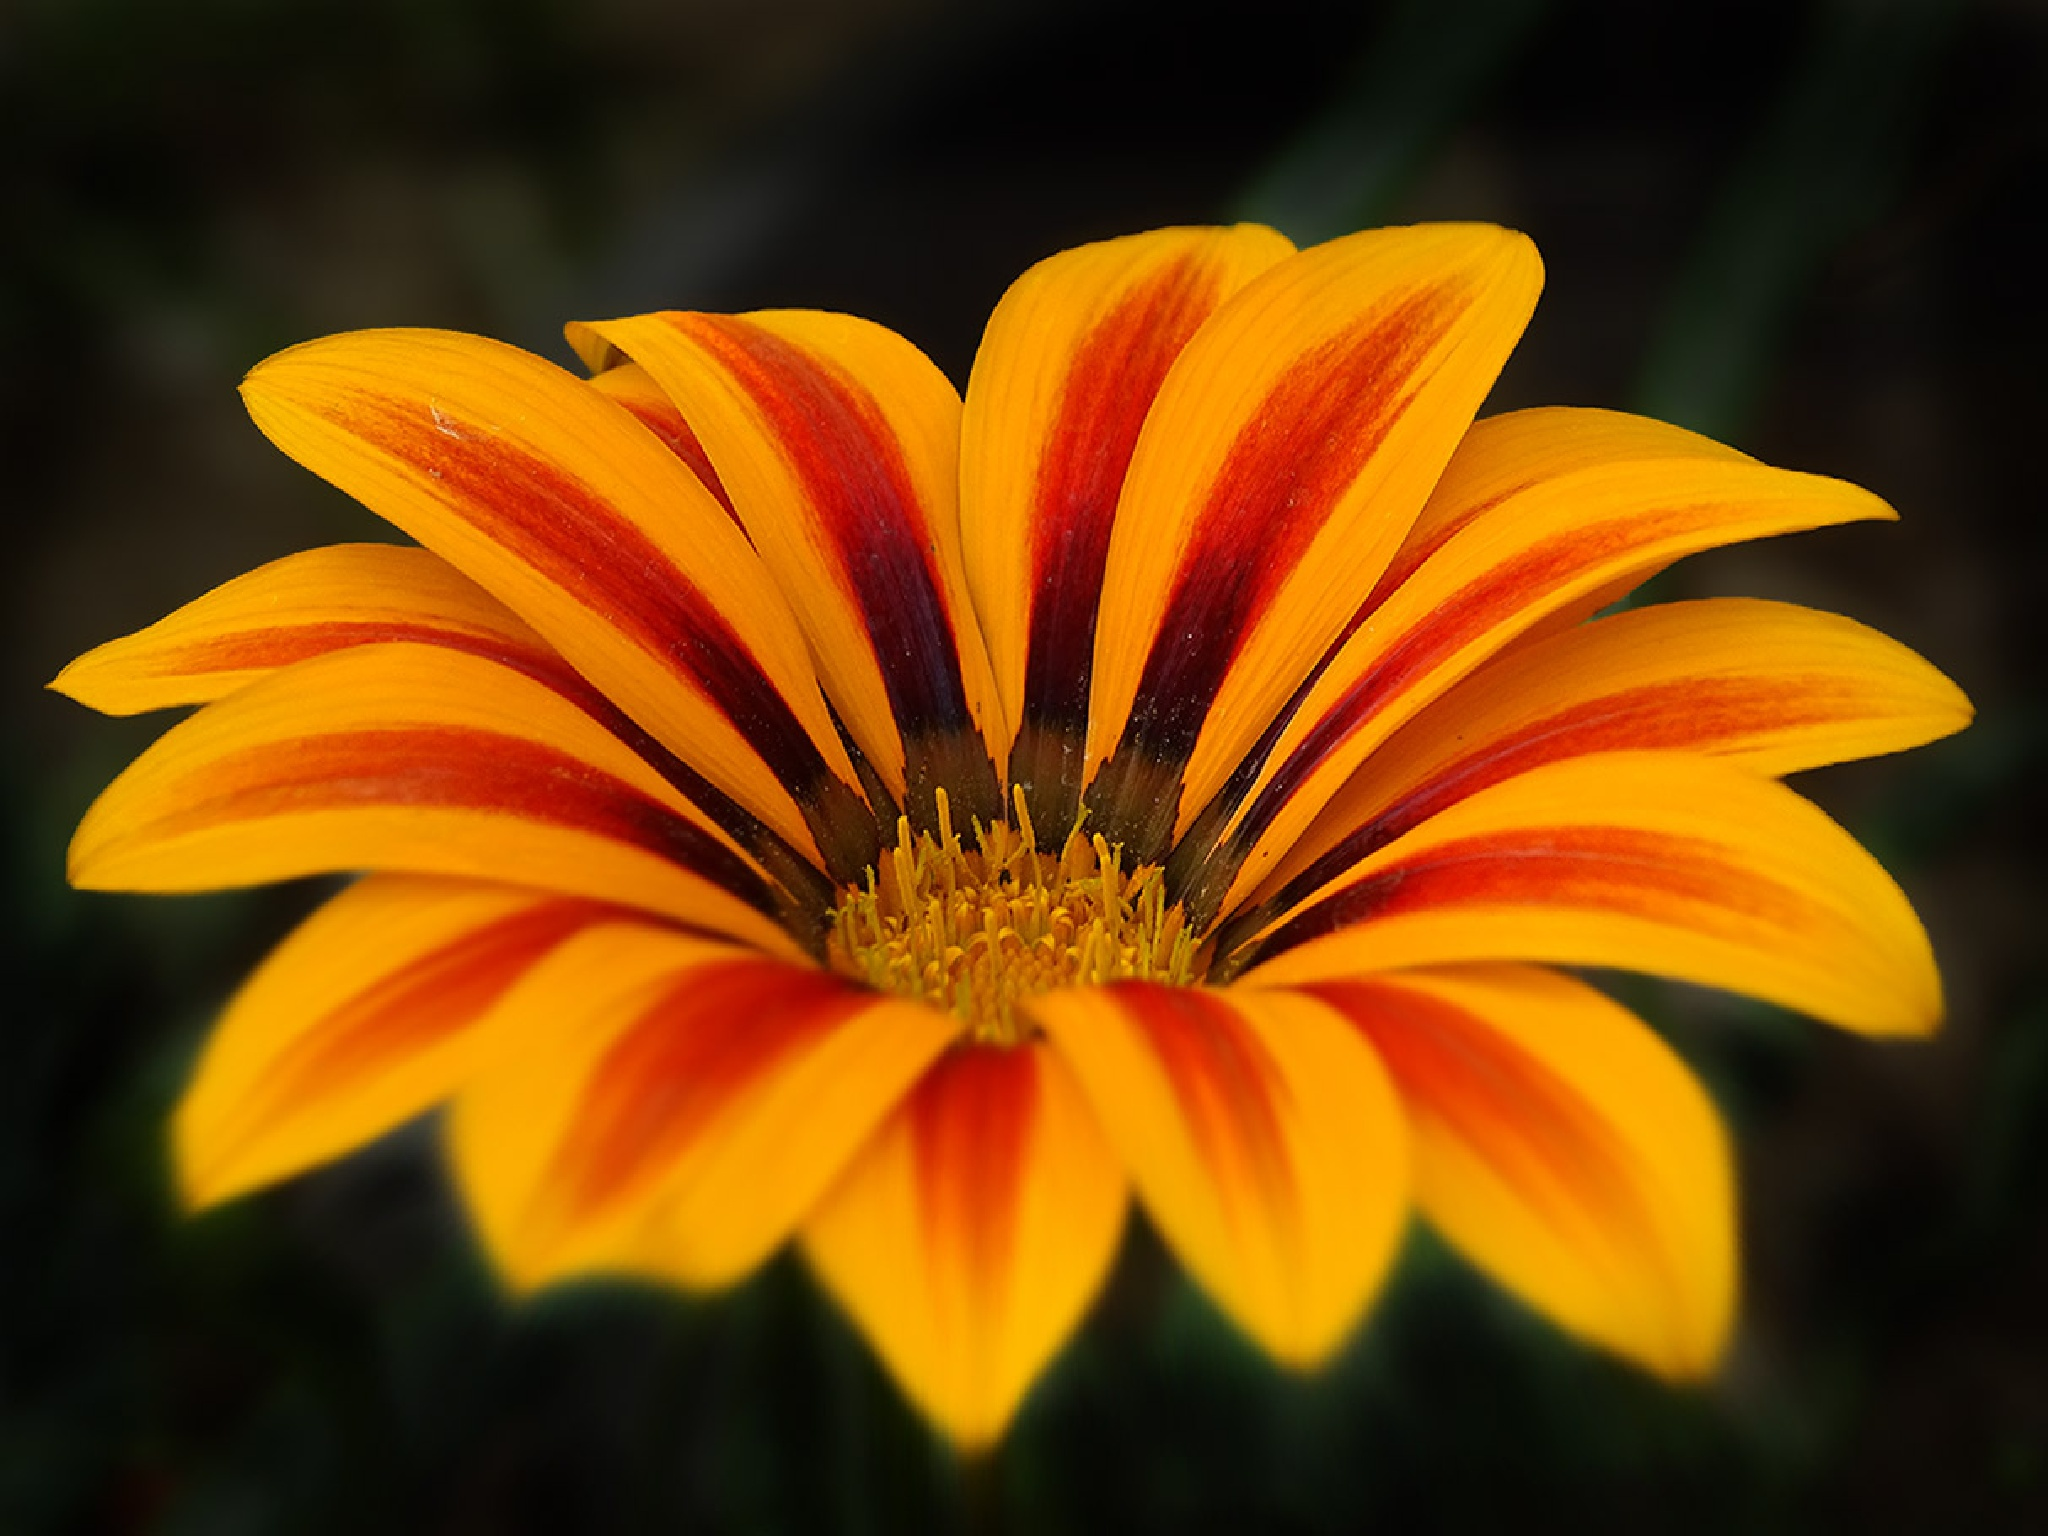 Flower by maryam 4